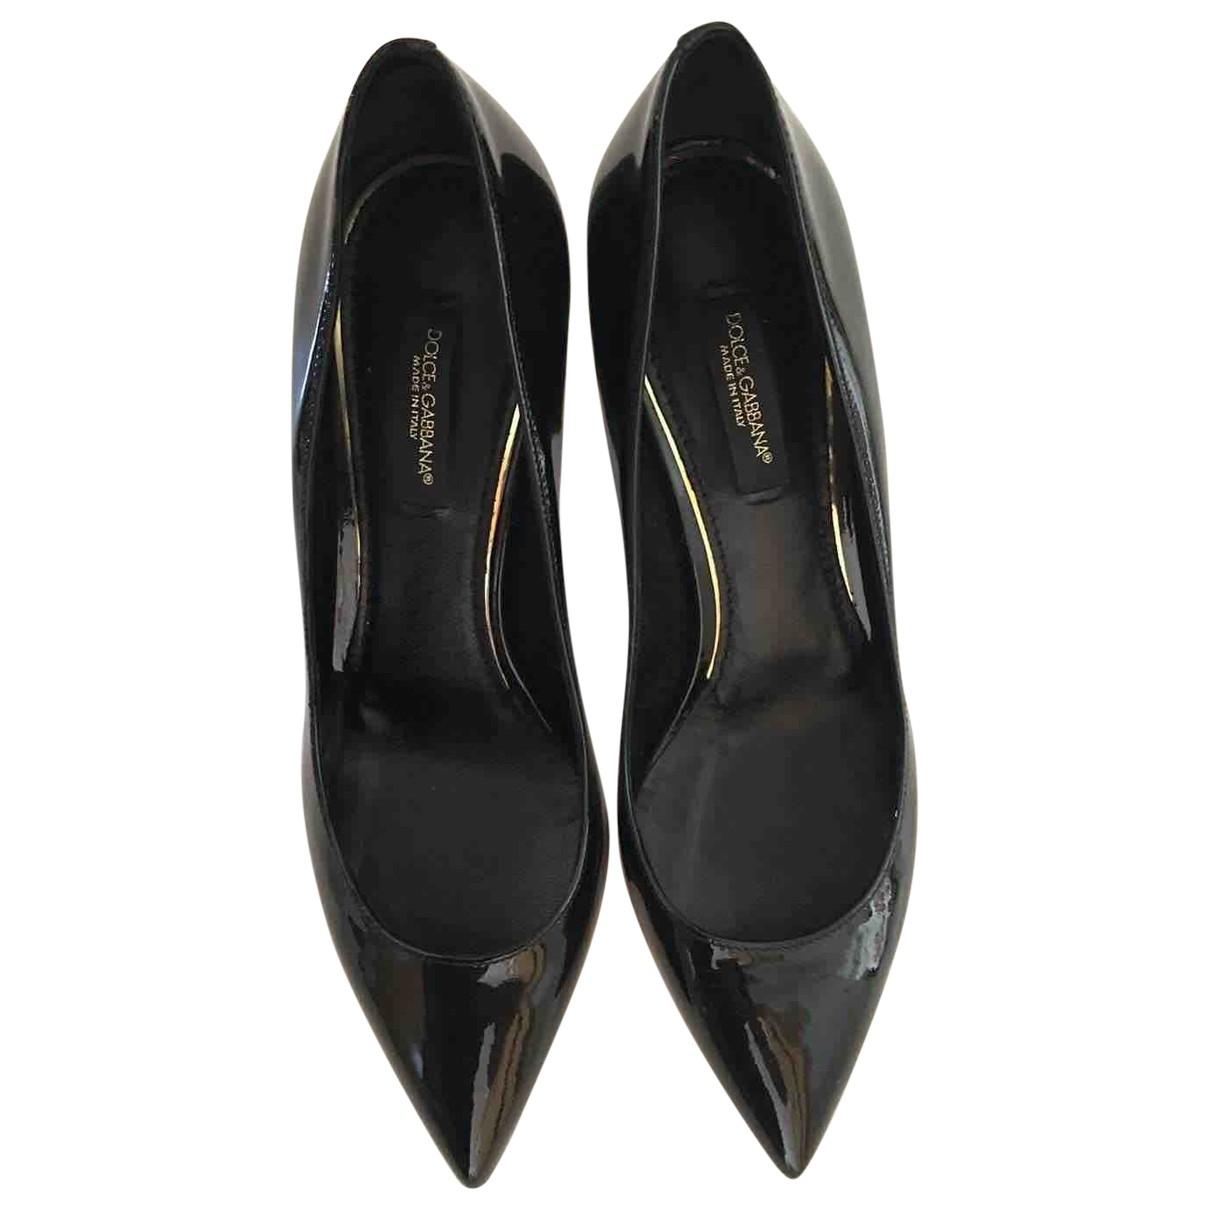 Dolce & Gabbana \N Black Patent leather Heels for Women 37 EU